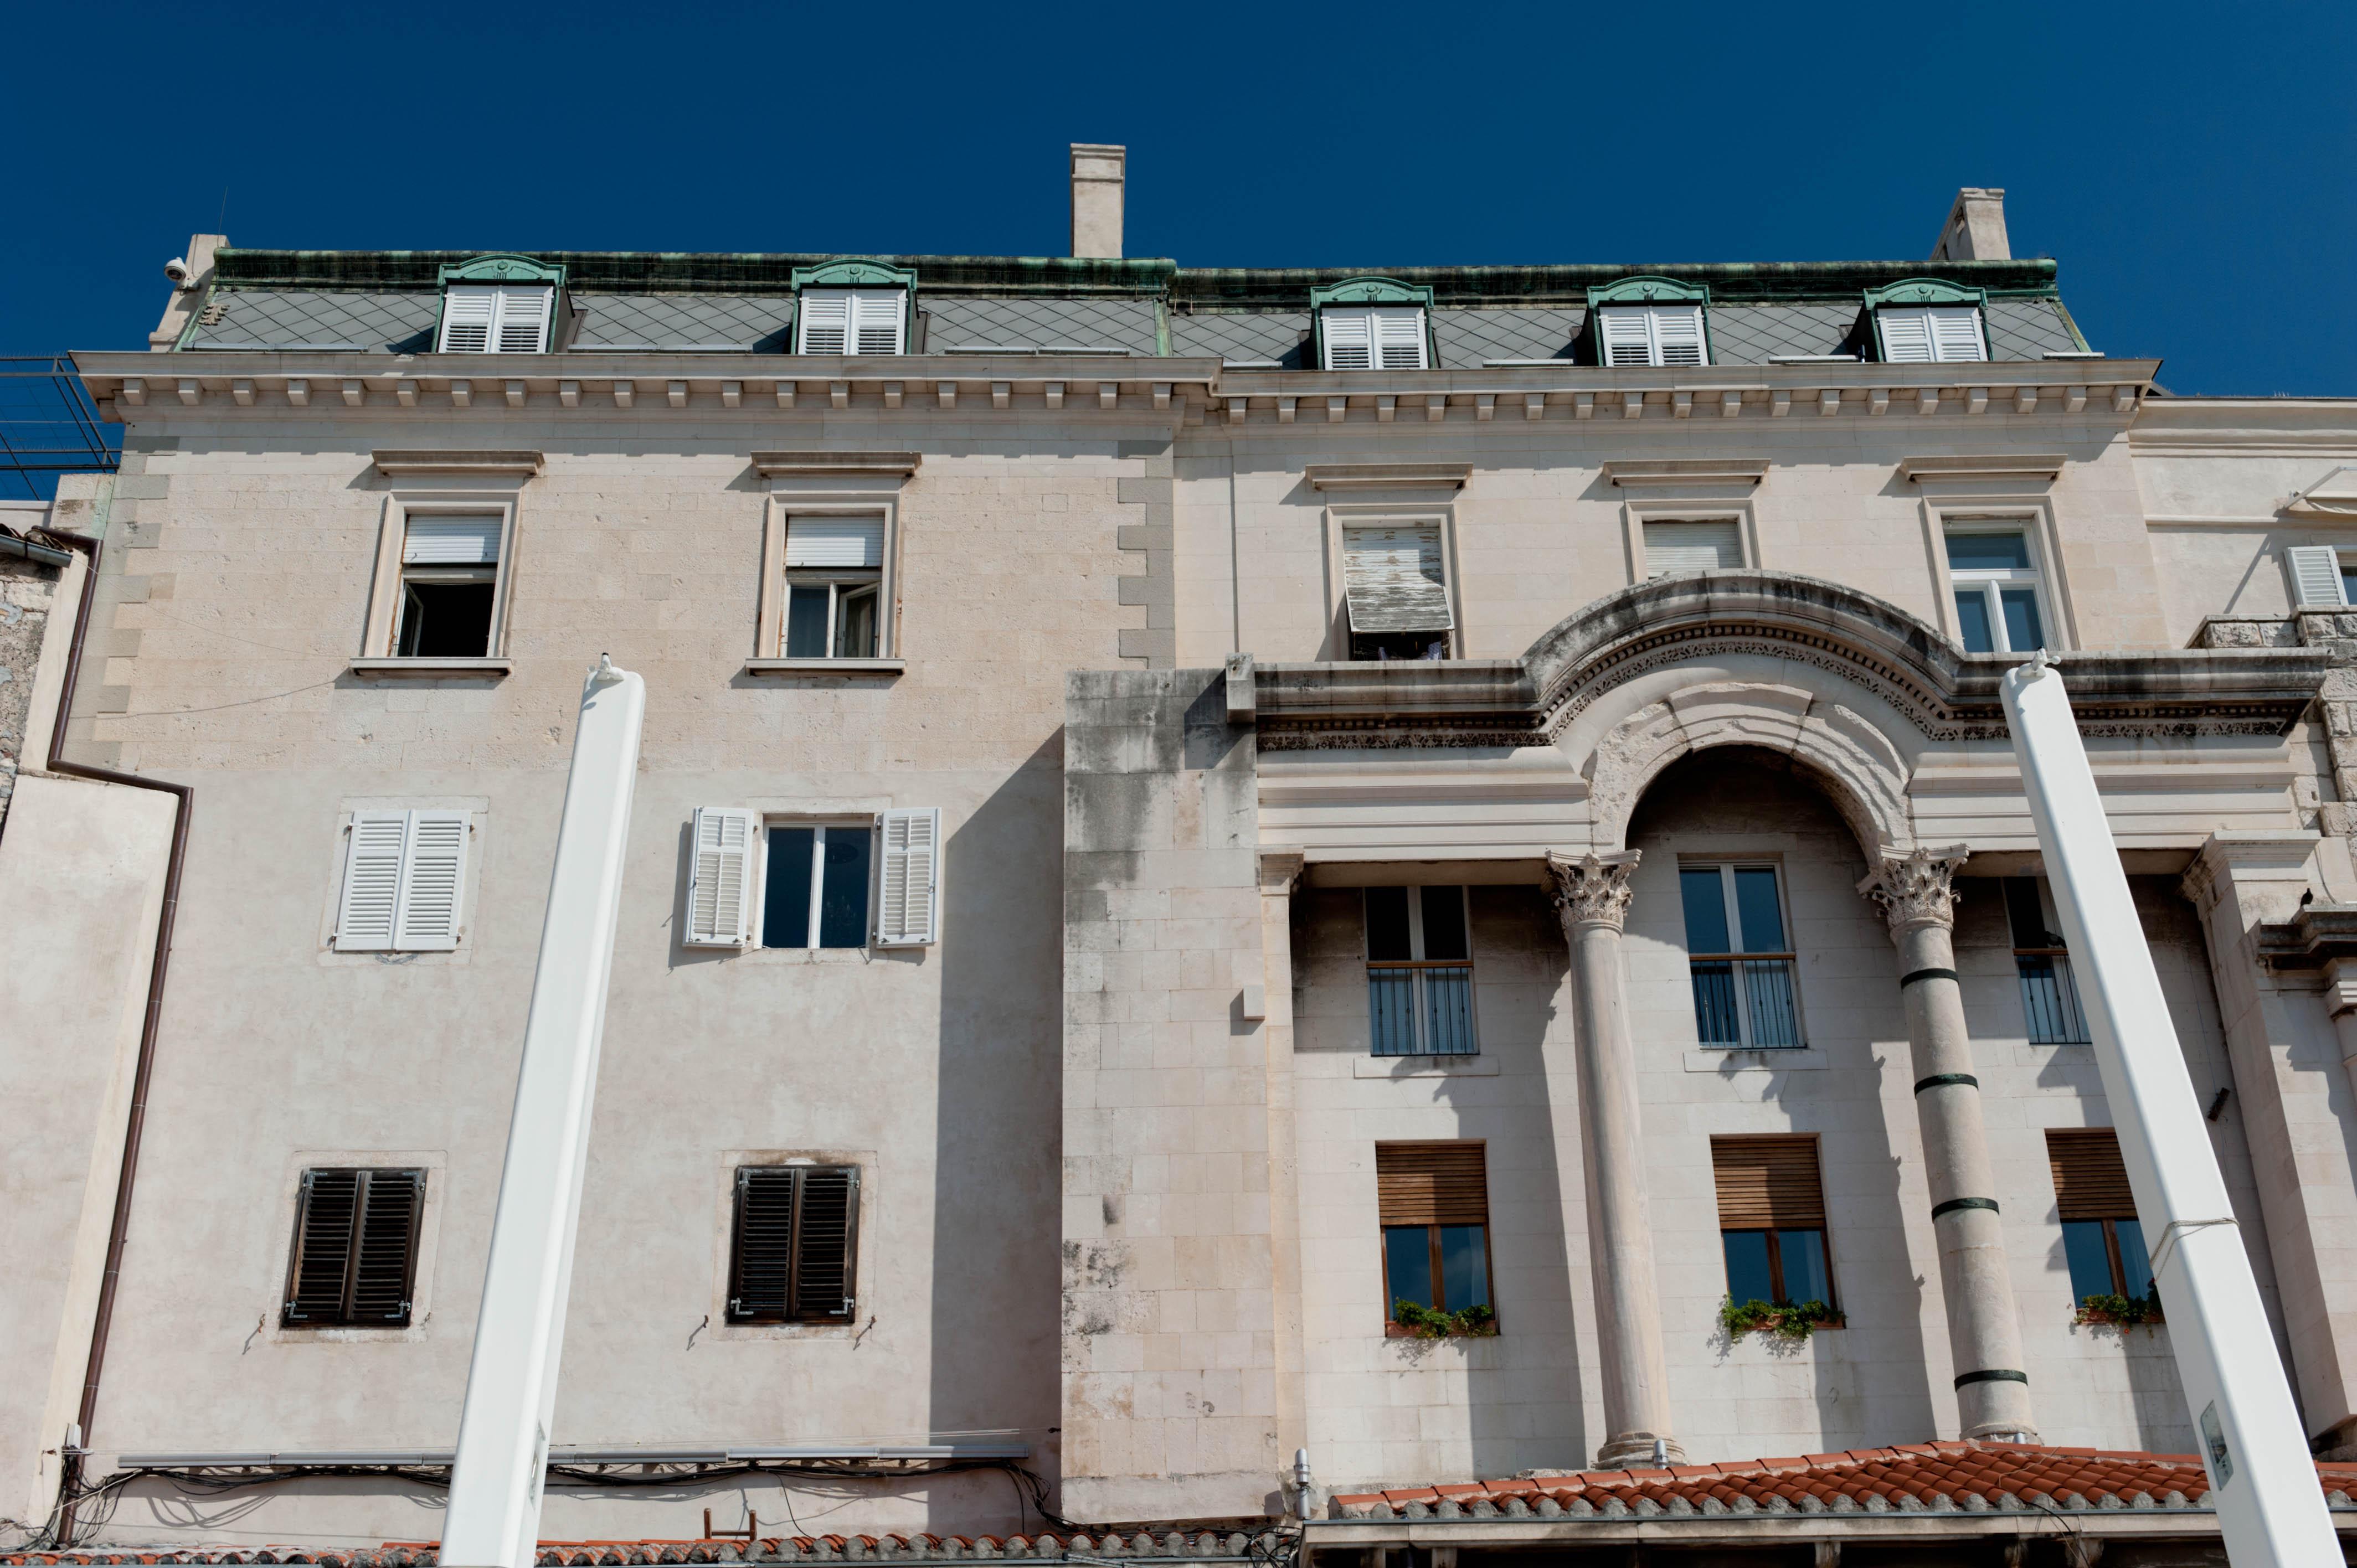 0434-Split (Dalmatie centrale)